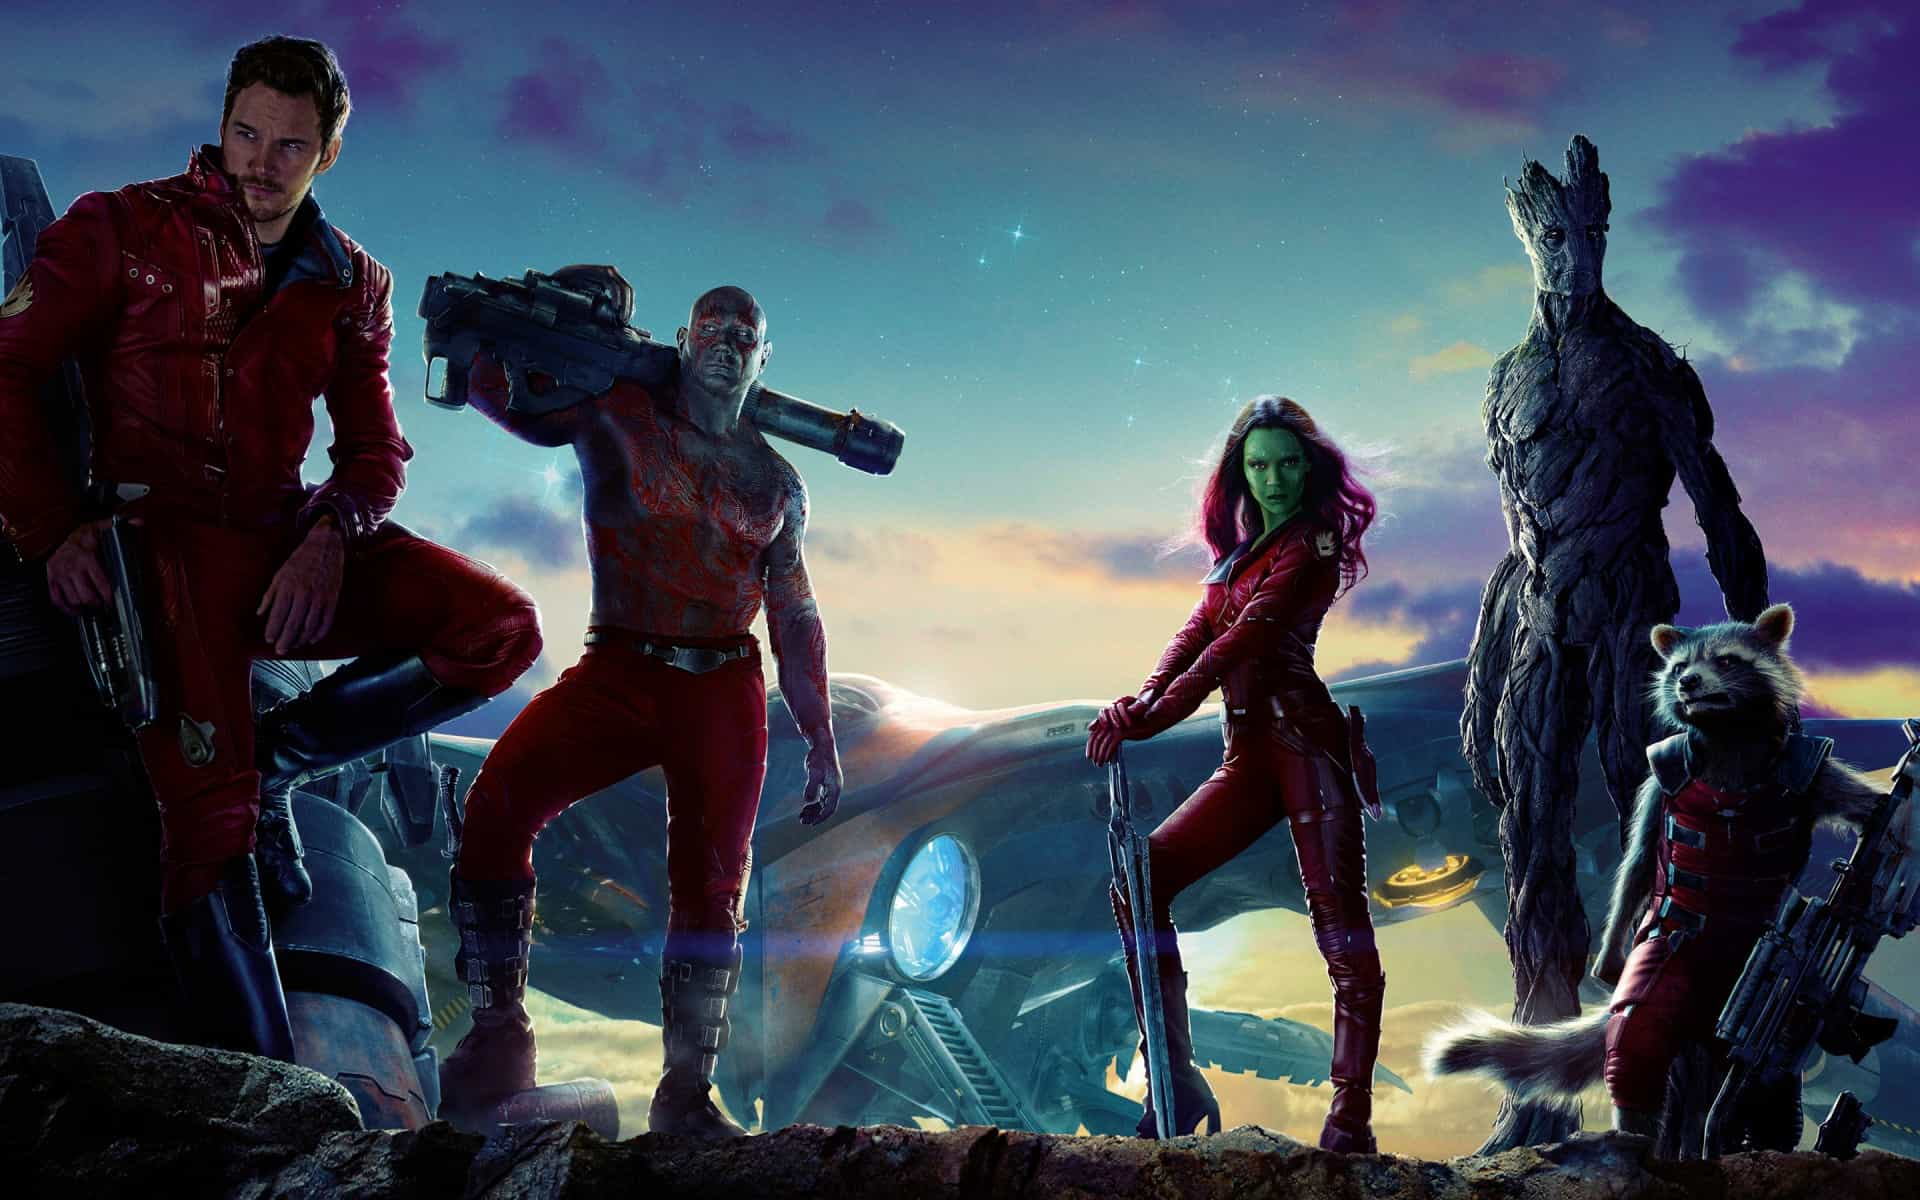 Wonderful Wallpaper Marvel Guardians The Galaxy - Guardians-Of-The-Galaxy-Movie-Poster-Wallpaper-1920x1200  Pictures_437366.jpg?fit\u003d1920%2C1200